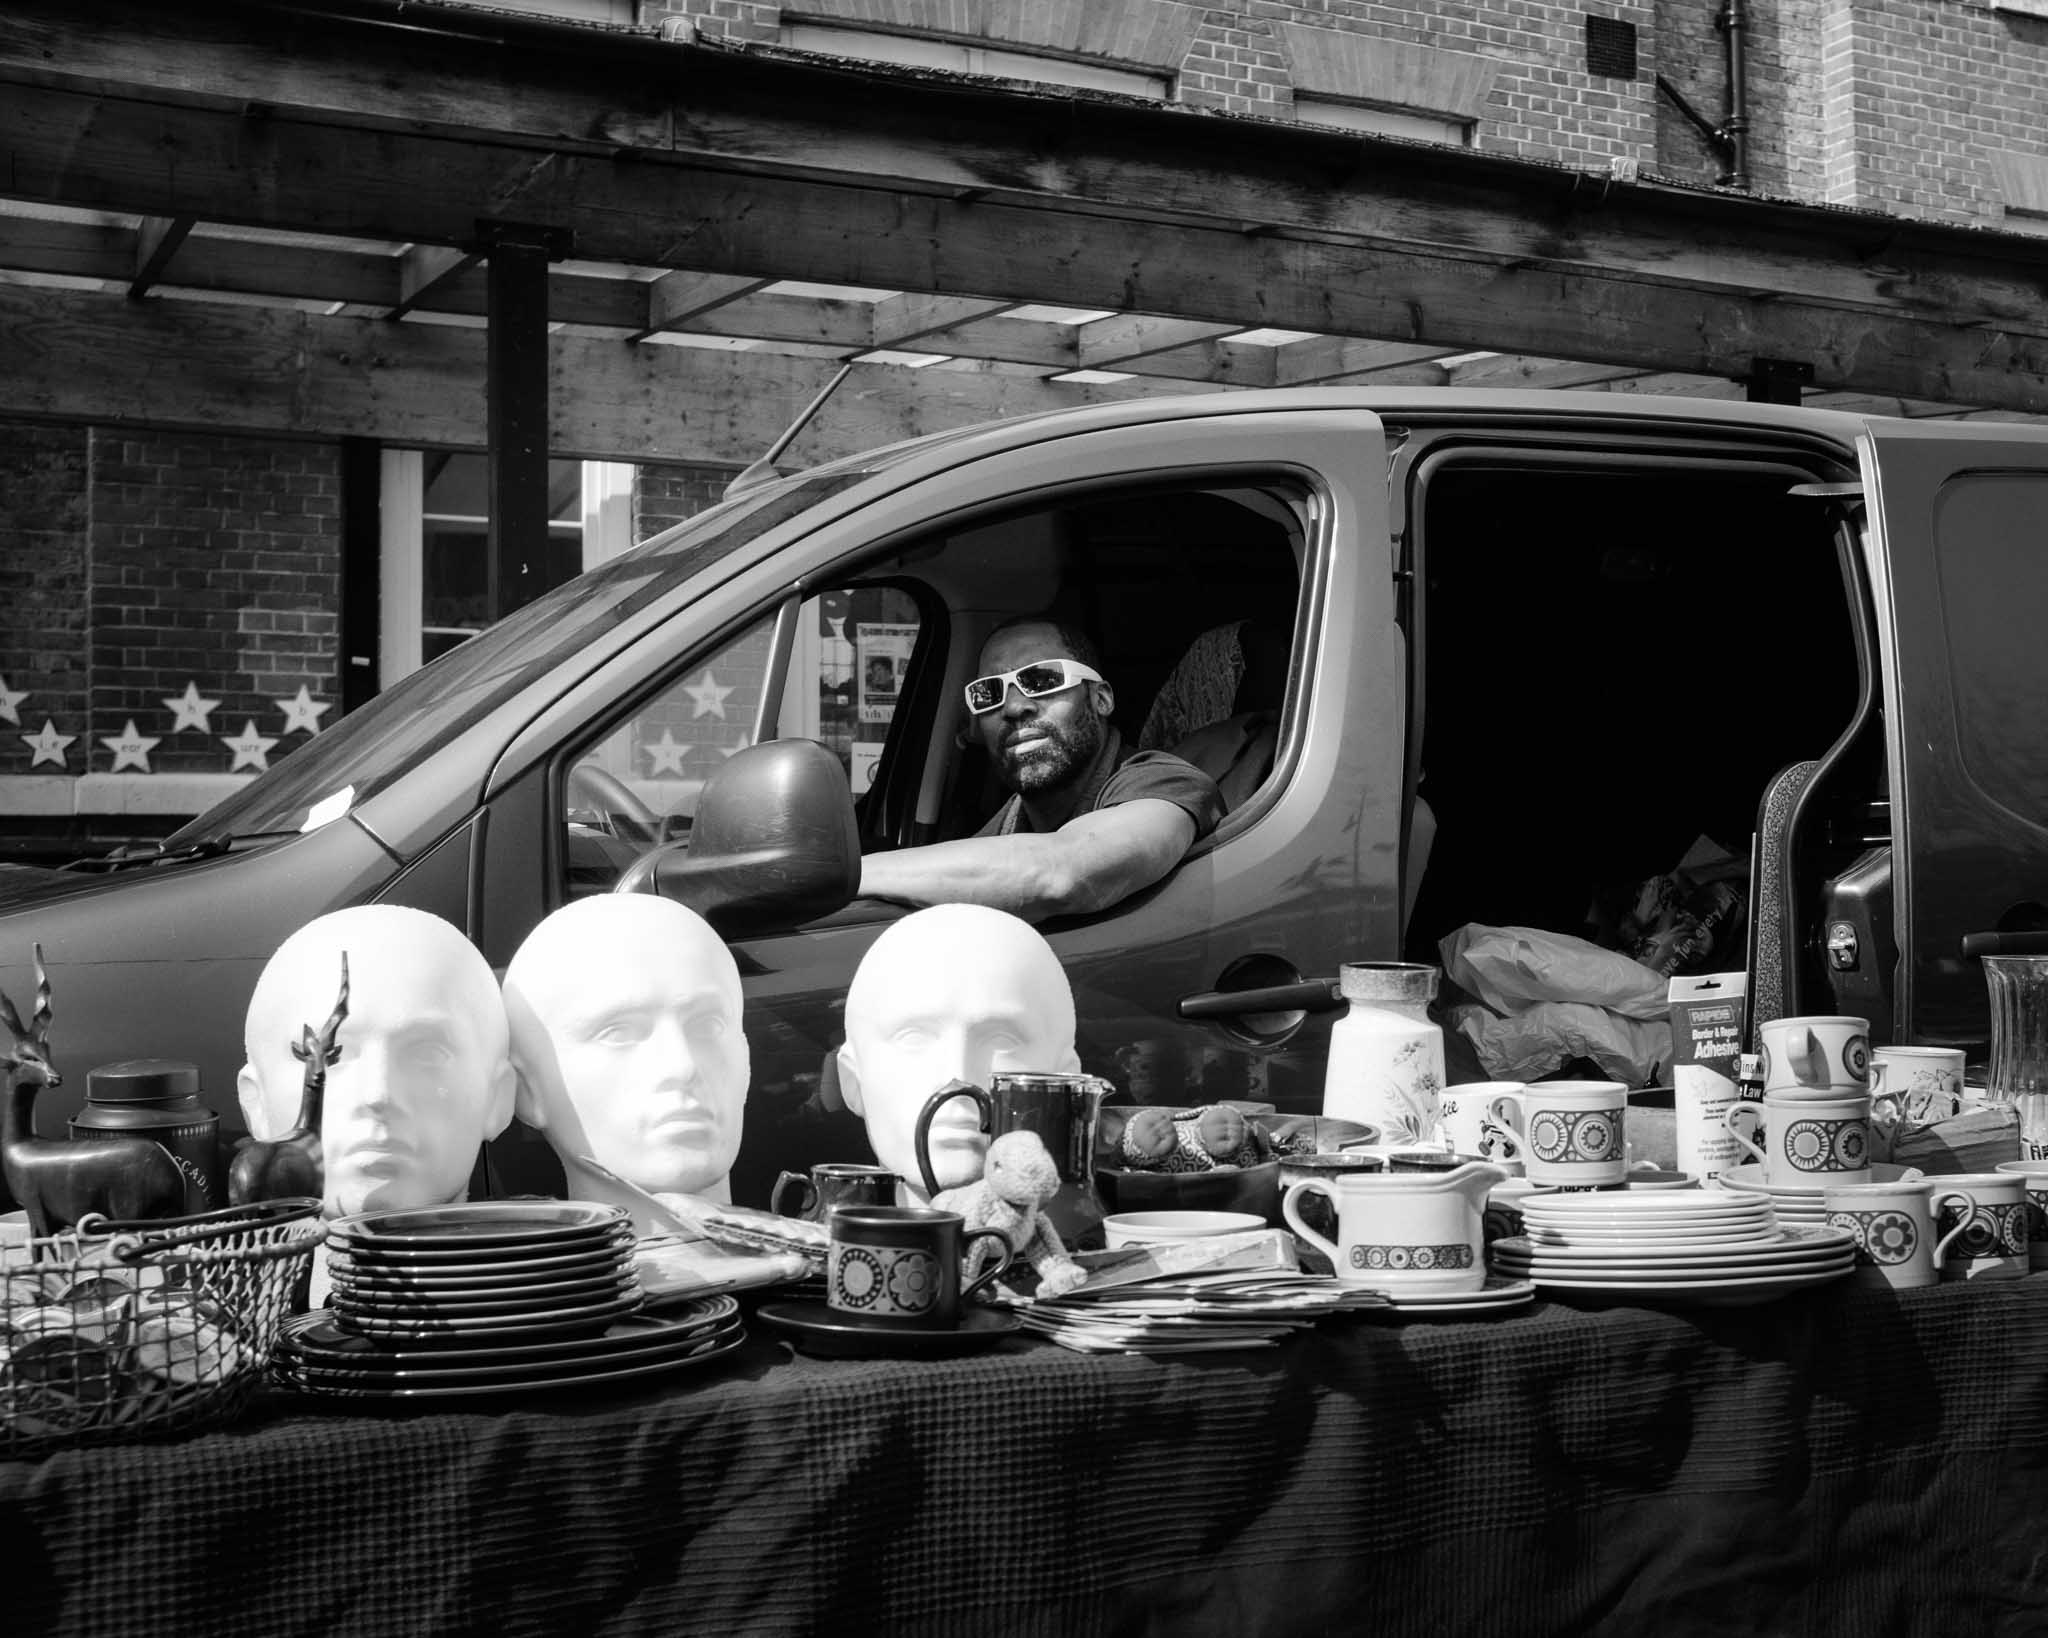 urban_street_photography_3.jpg